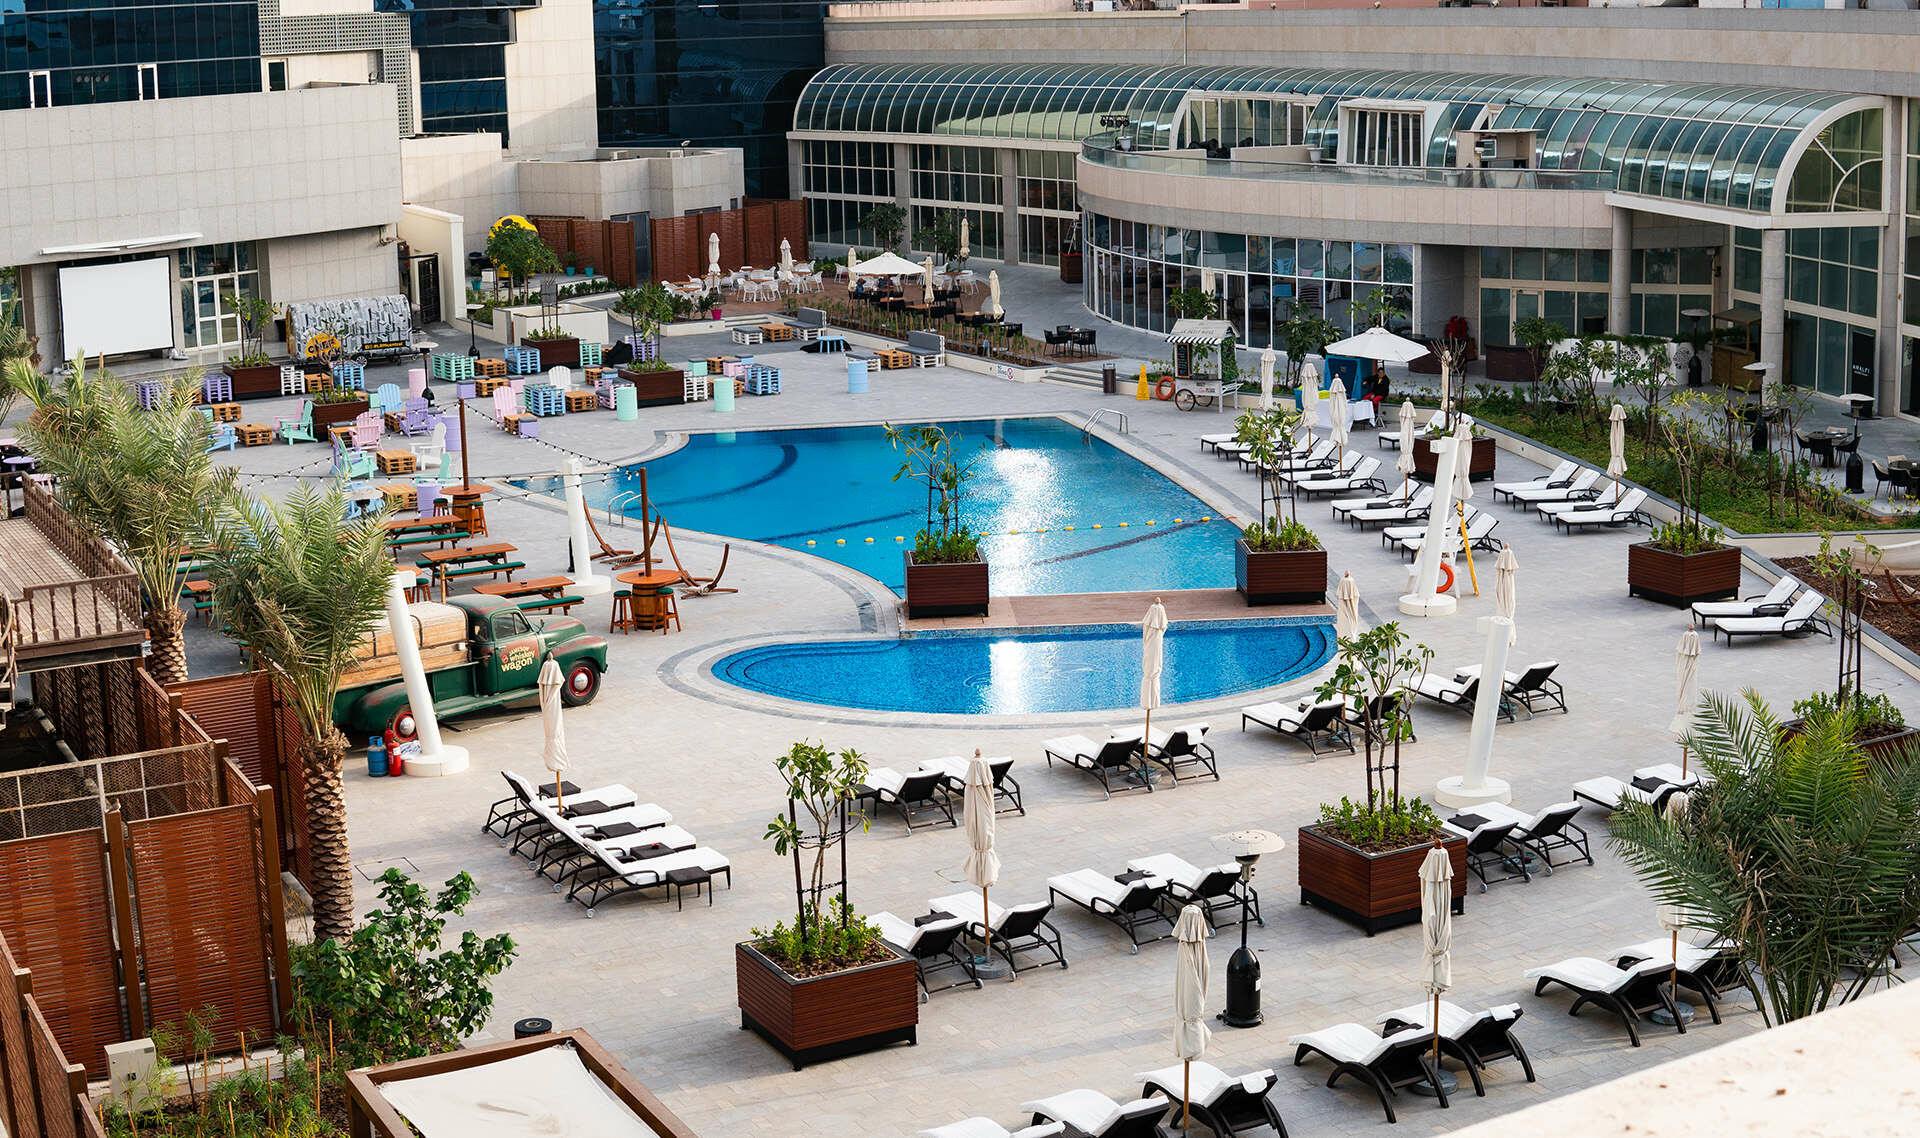 Swimming Pool at Al Ain Palace Hotel in Abu Dhabi, United Arab E